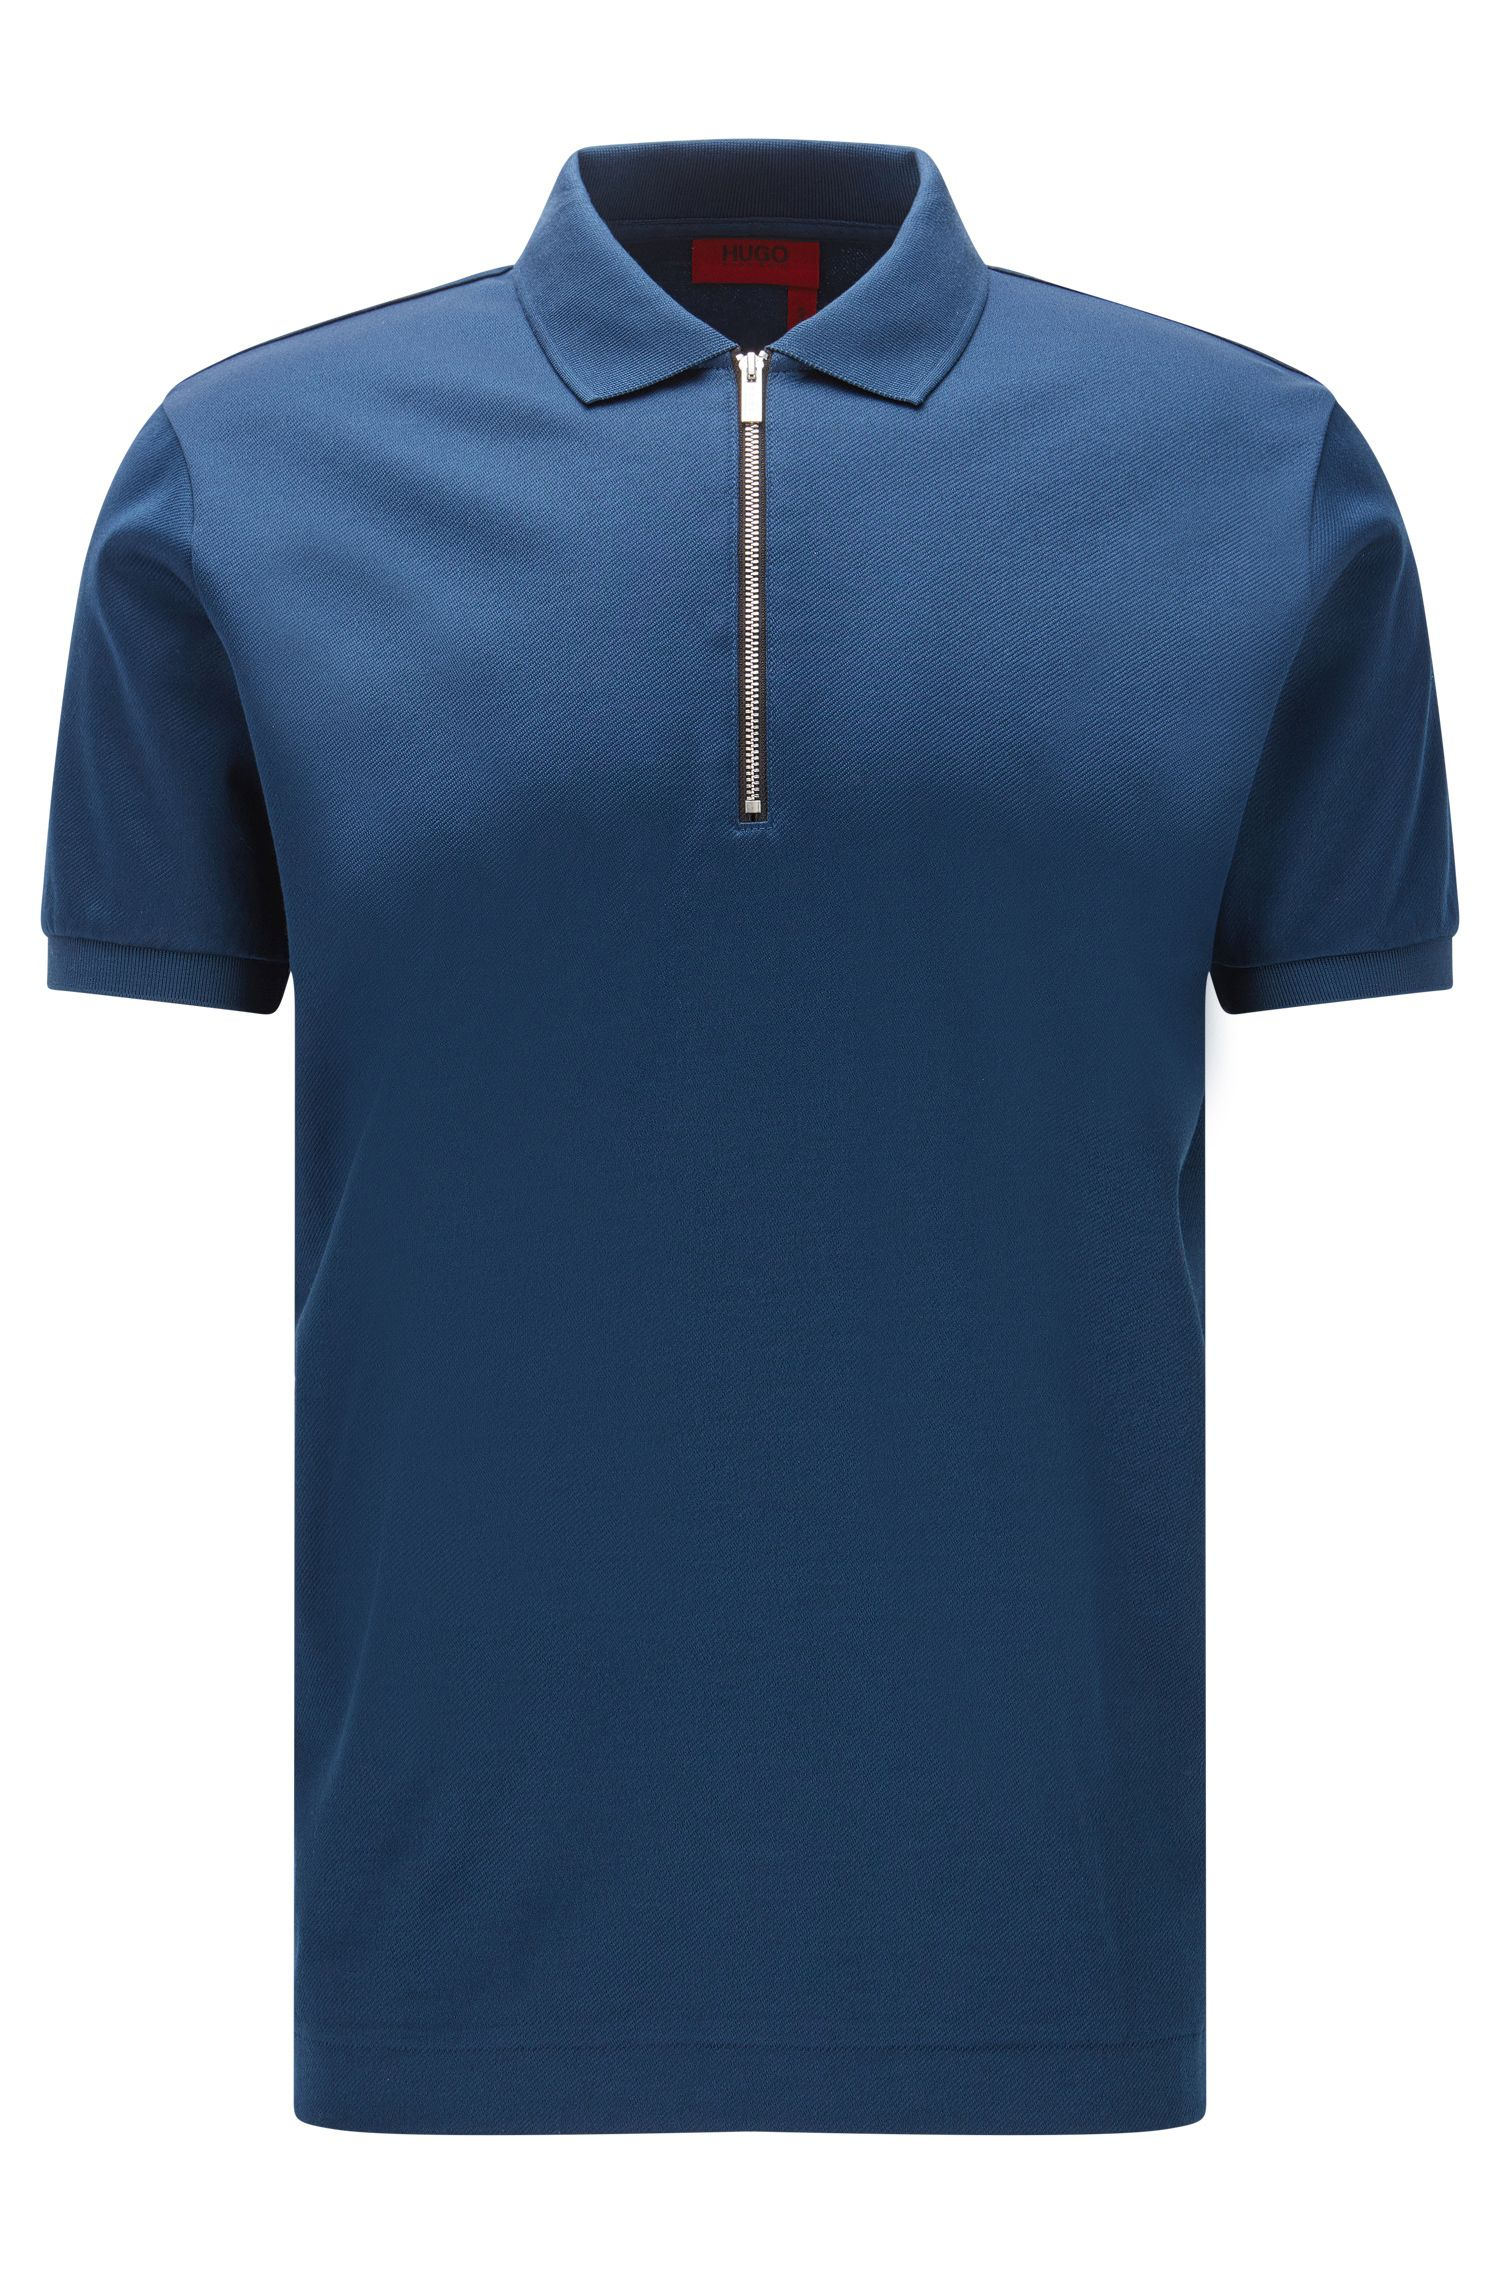 Mercerized Cotton Twill Polo Shirt, Regular Fit | Digato